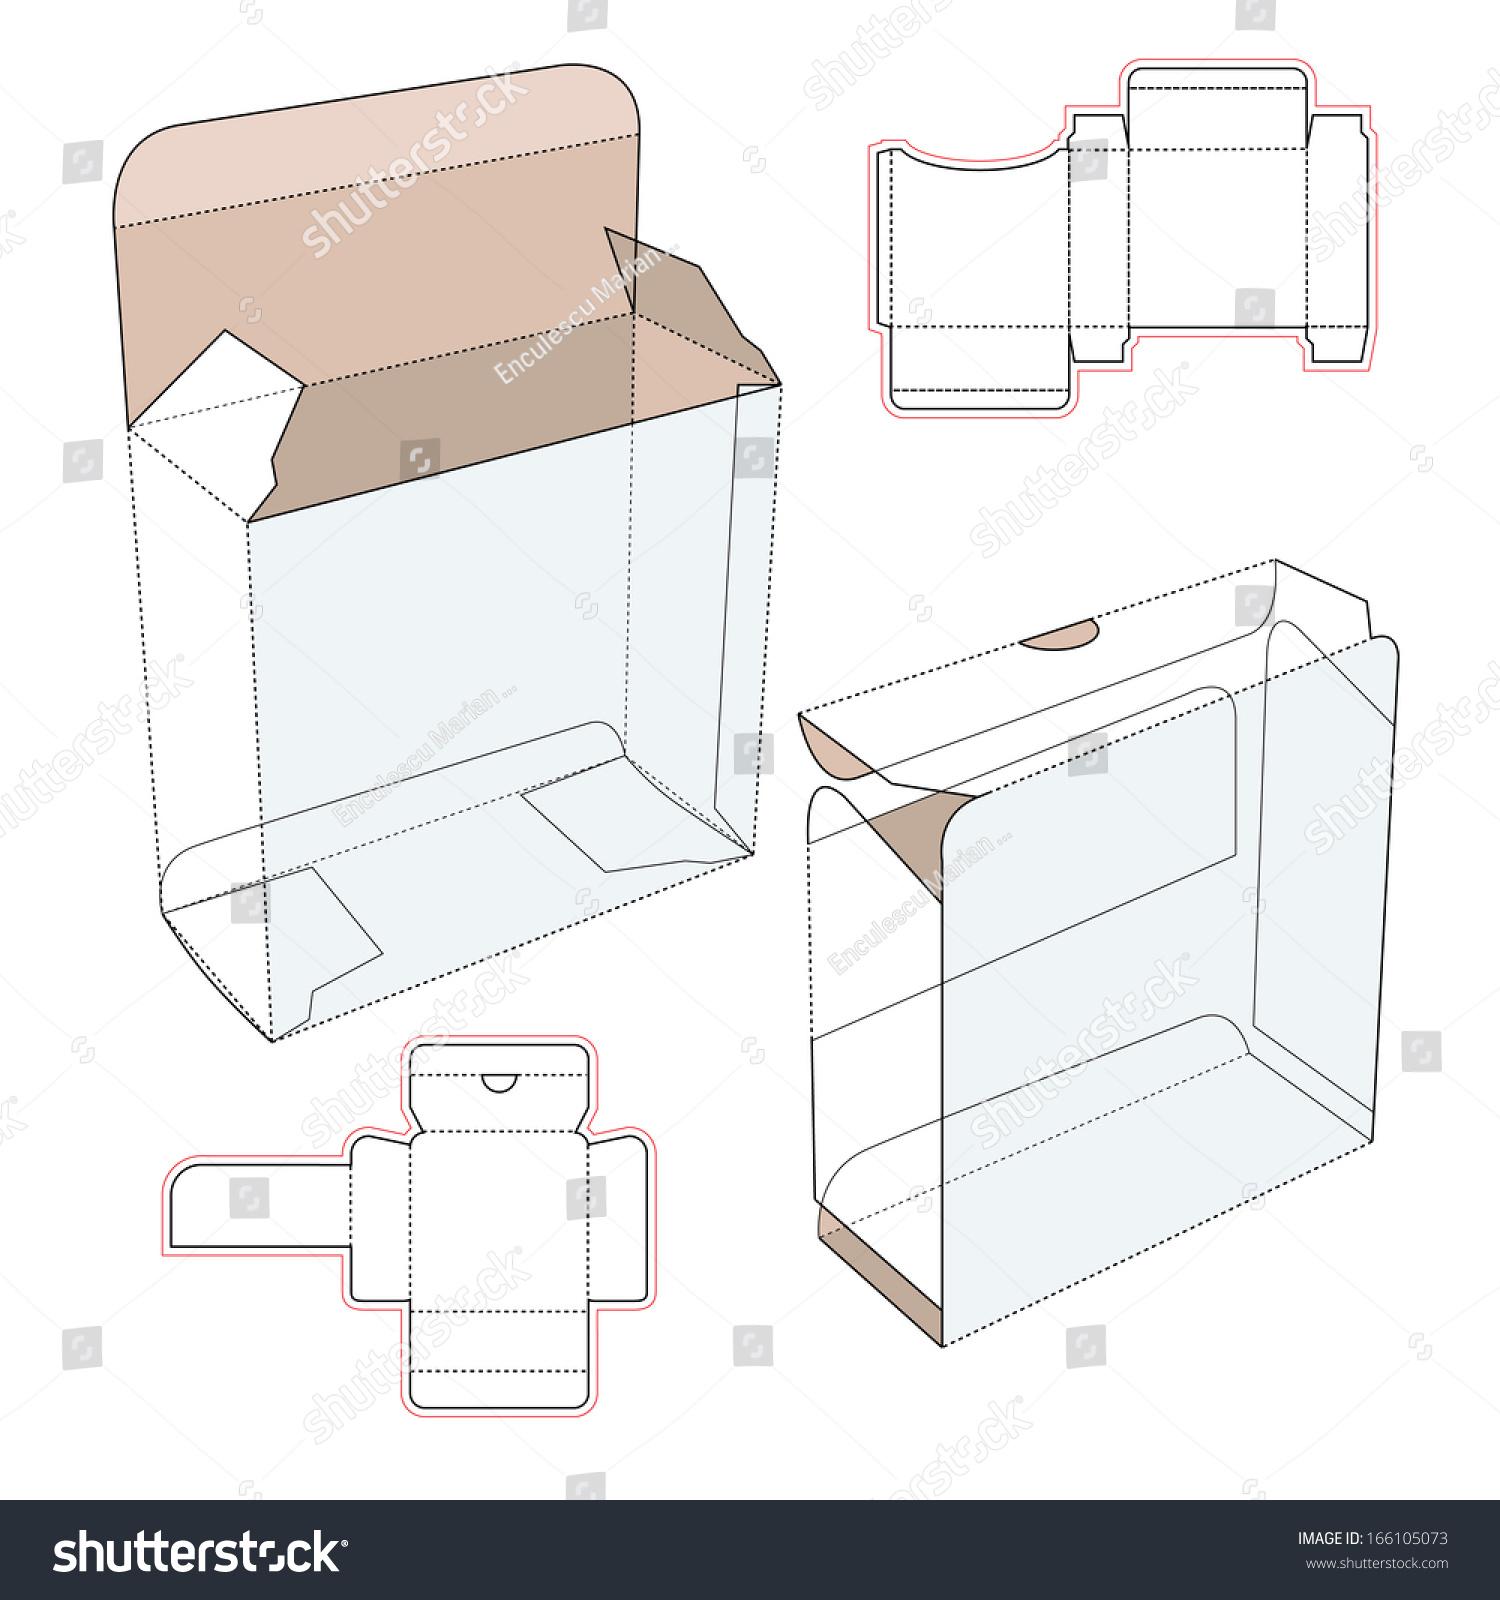 Perfume Cardboard Box Blueprint Template Stock Vector 166105073 ...